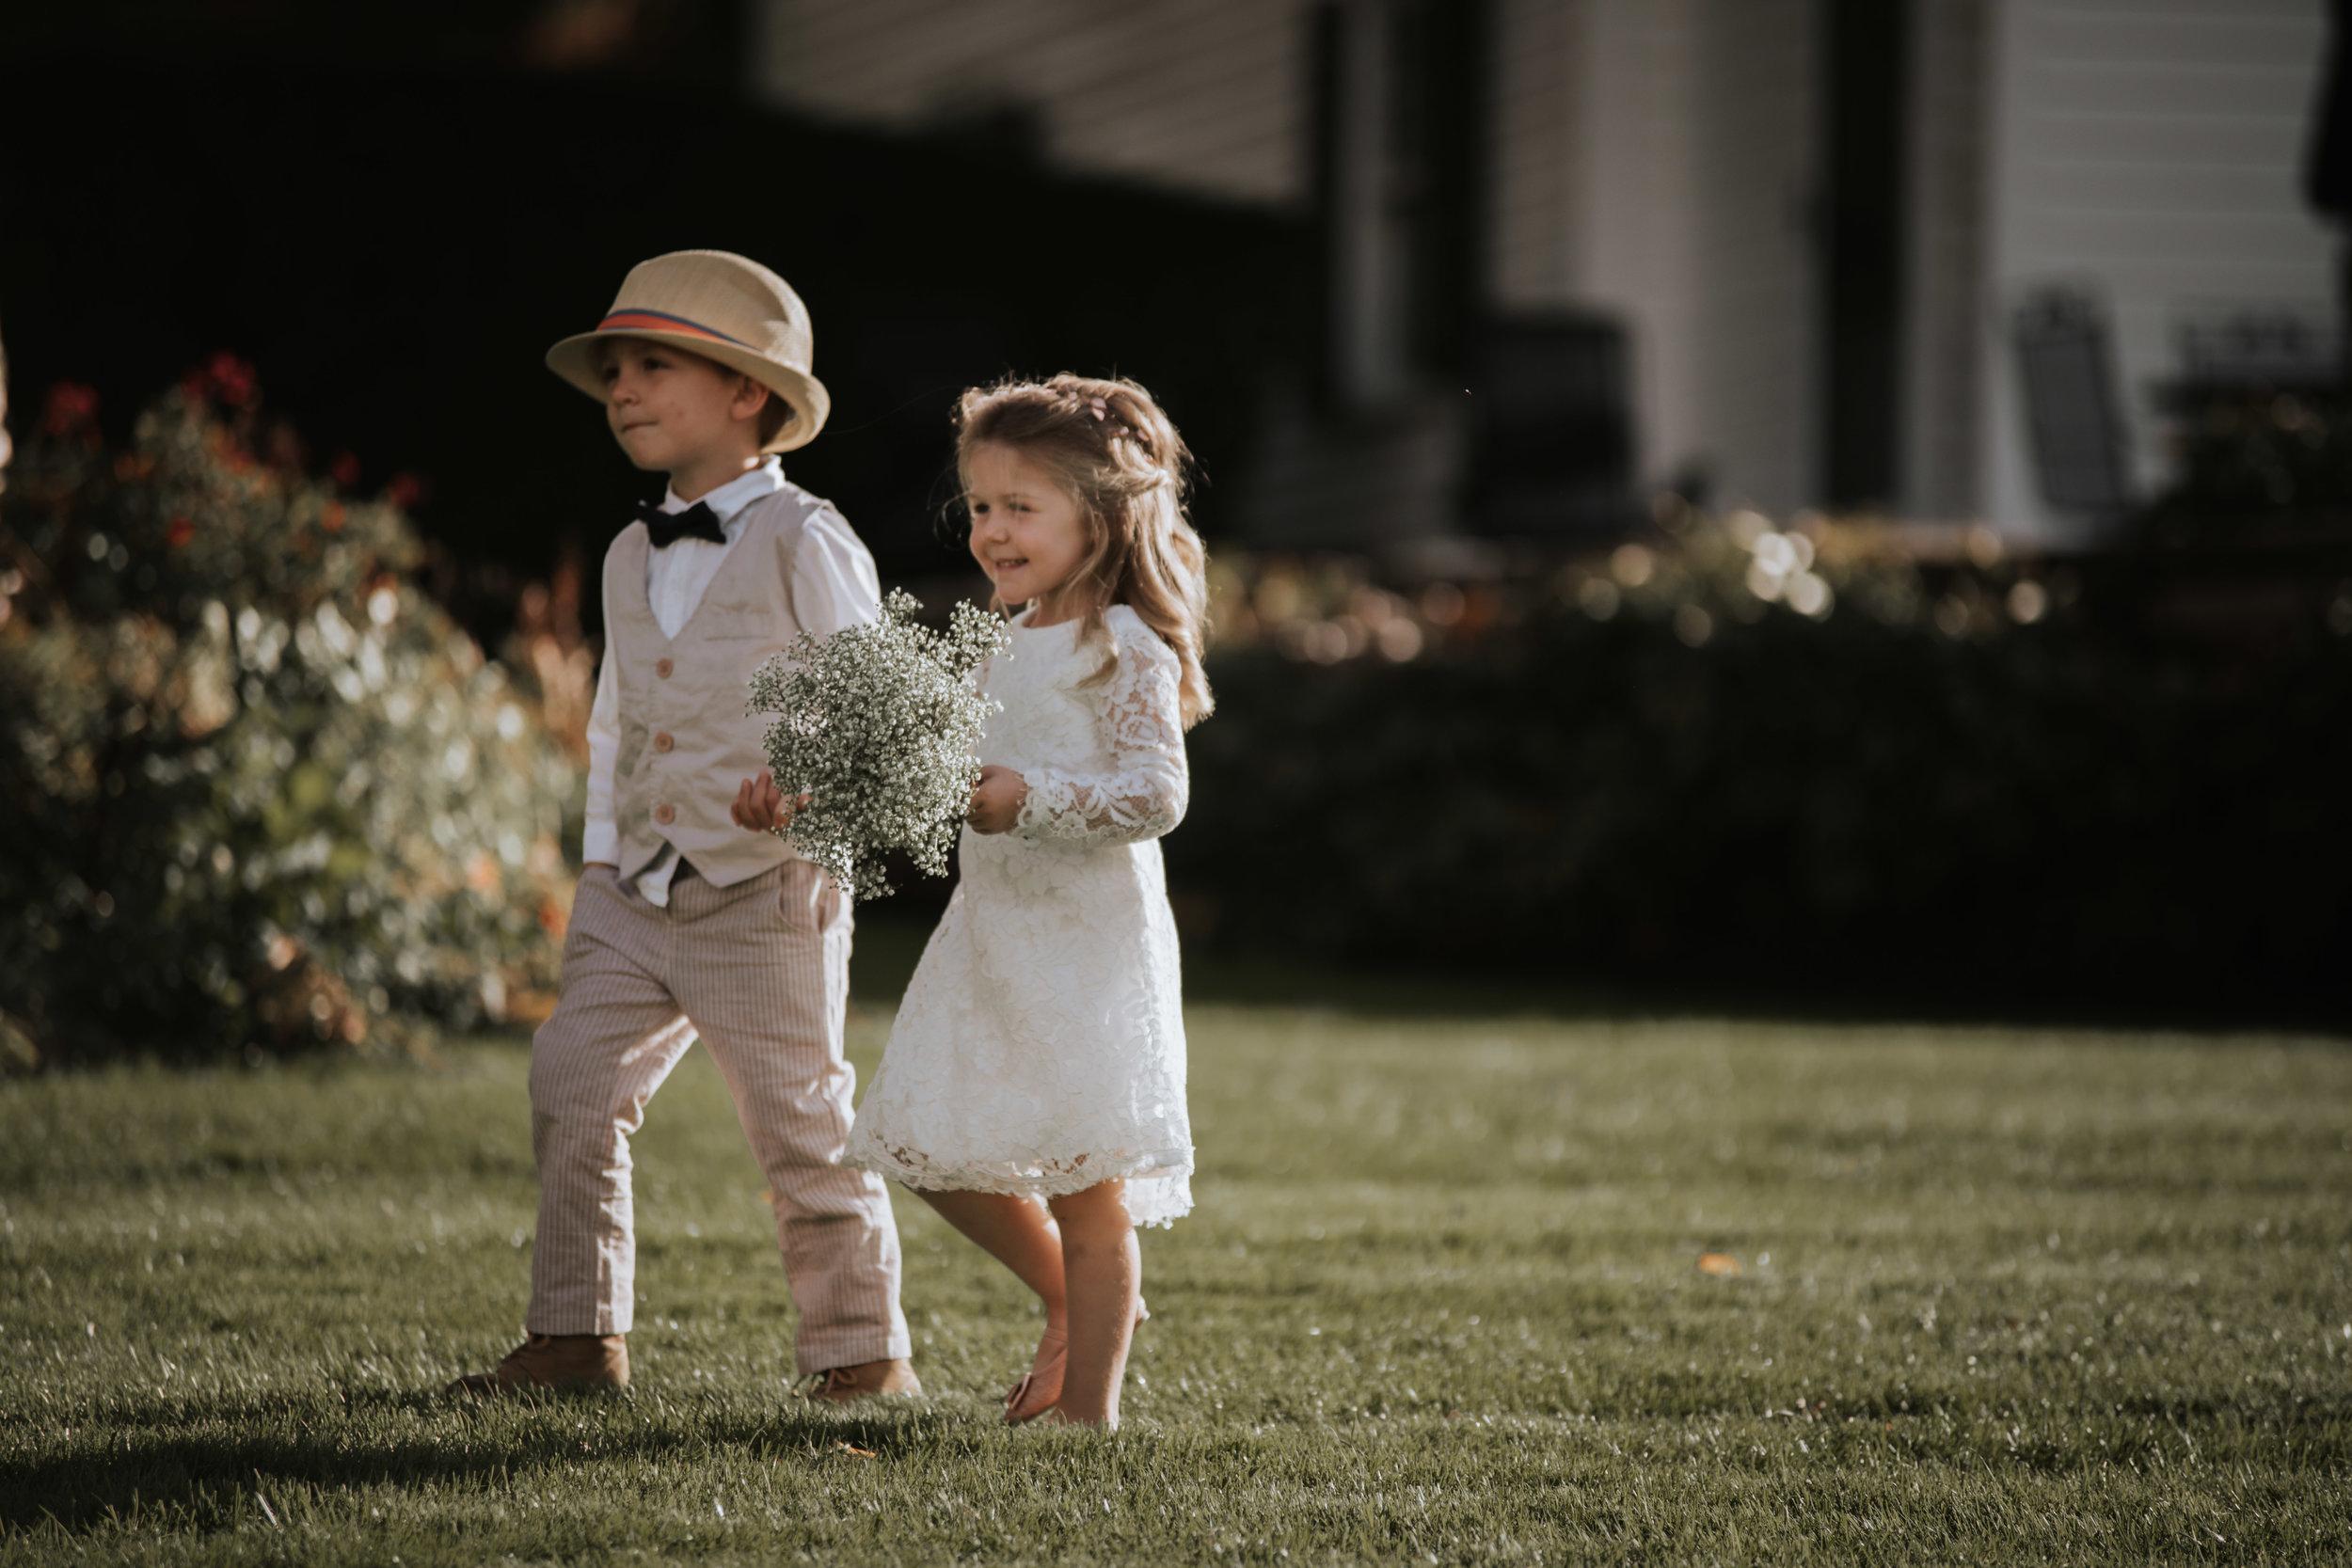 Vermont Wedding | Lorianna Weathers Photography-0442.jpg